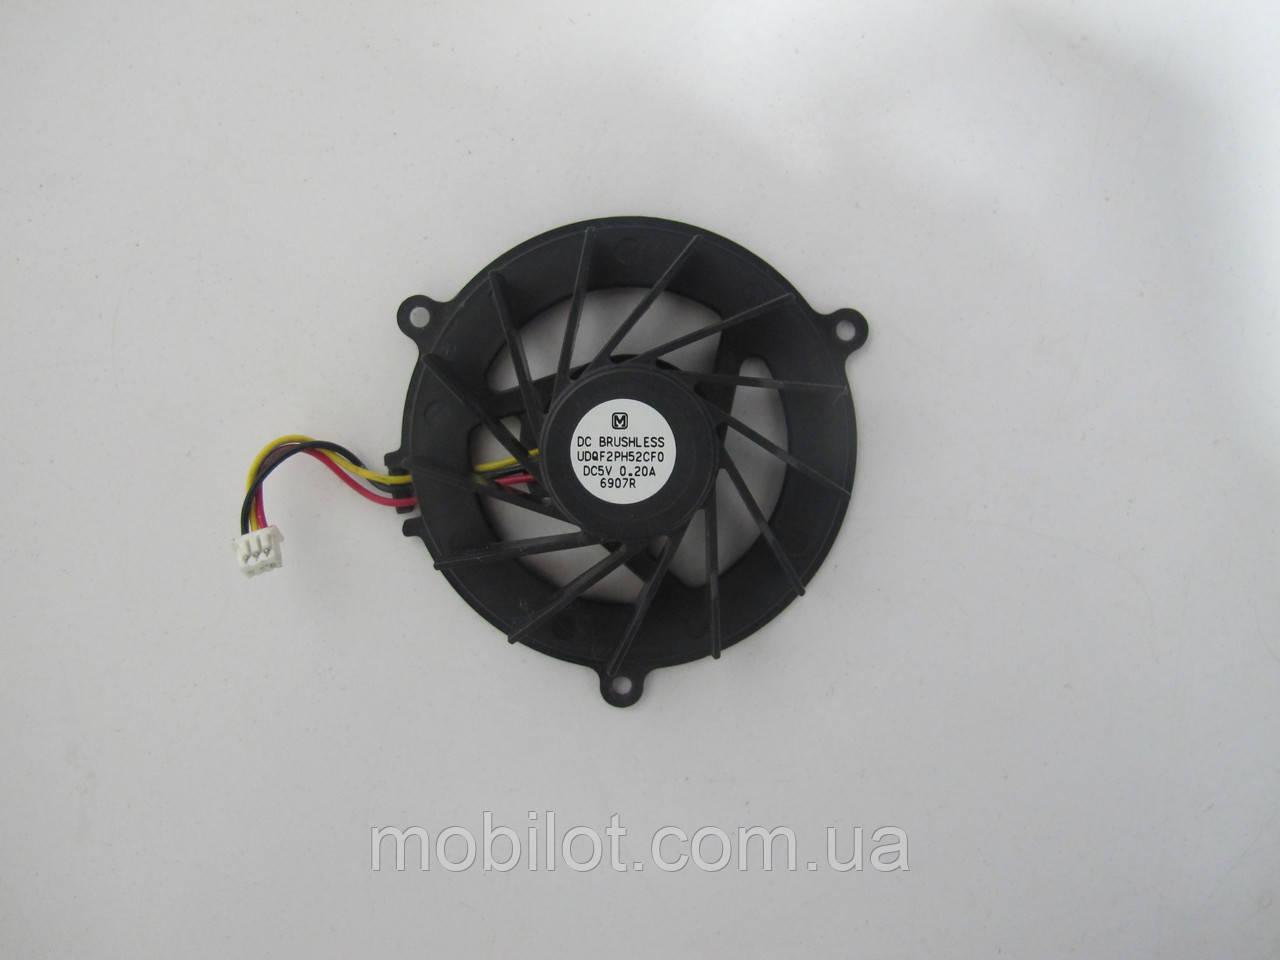 Система охлаждения (кулер) Sony VGN-N series (NZ-4942)